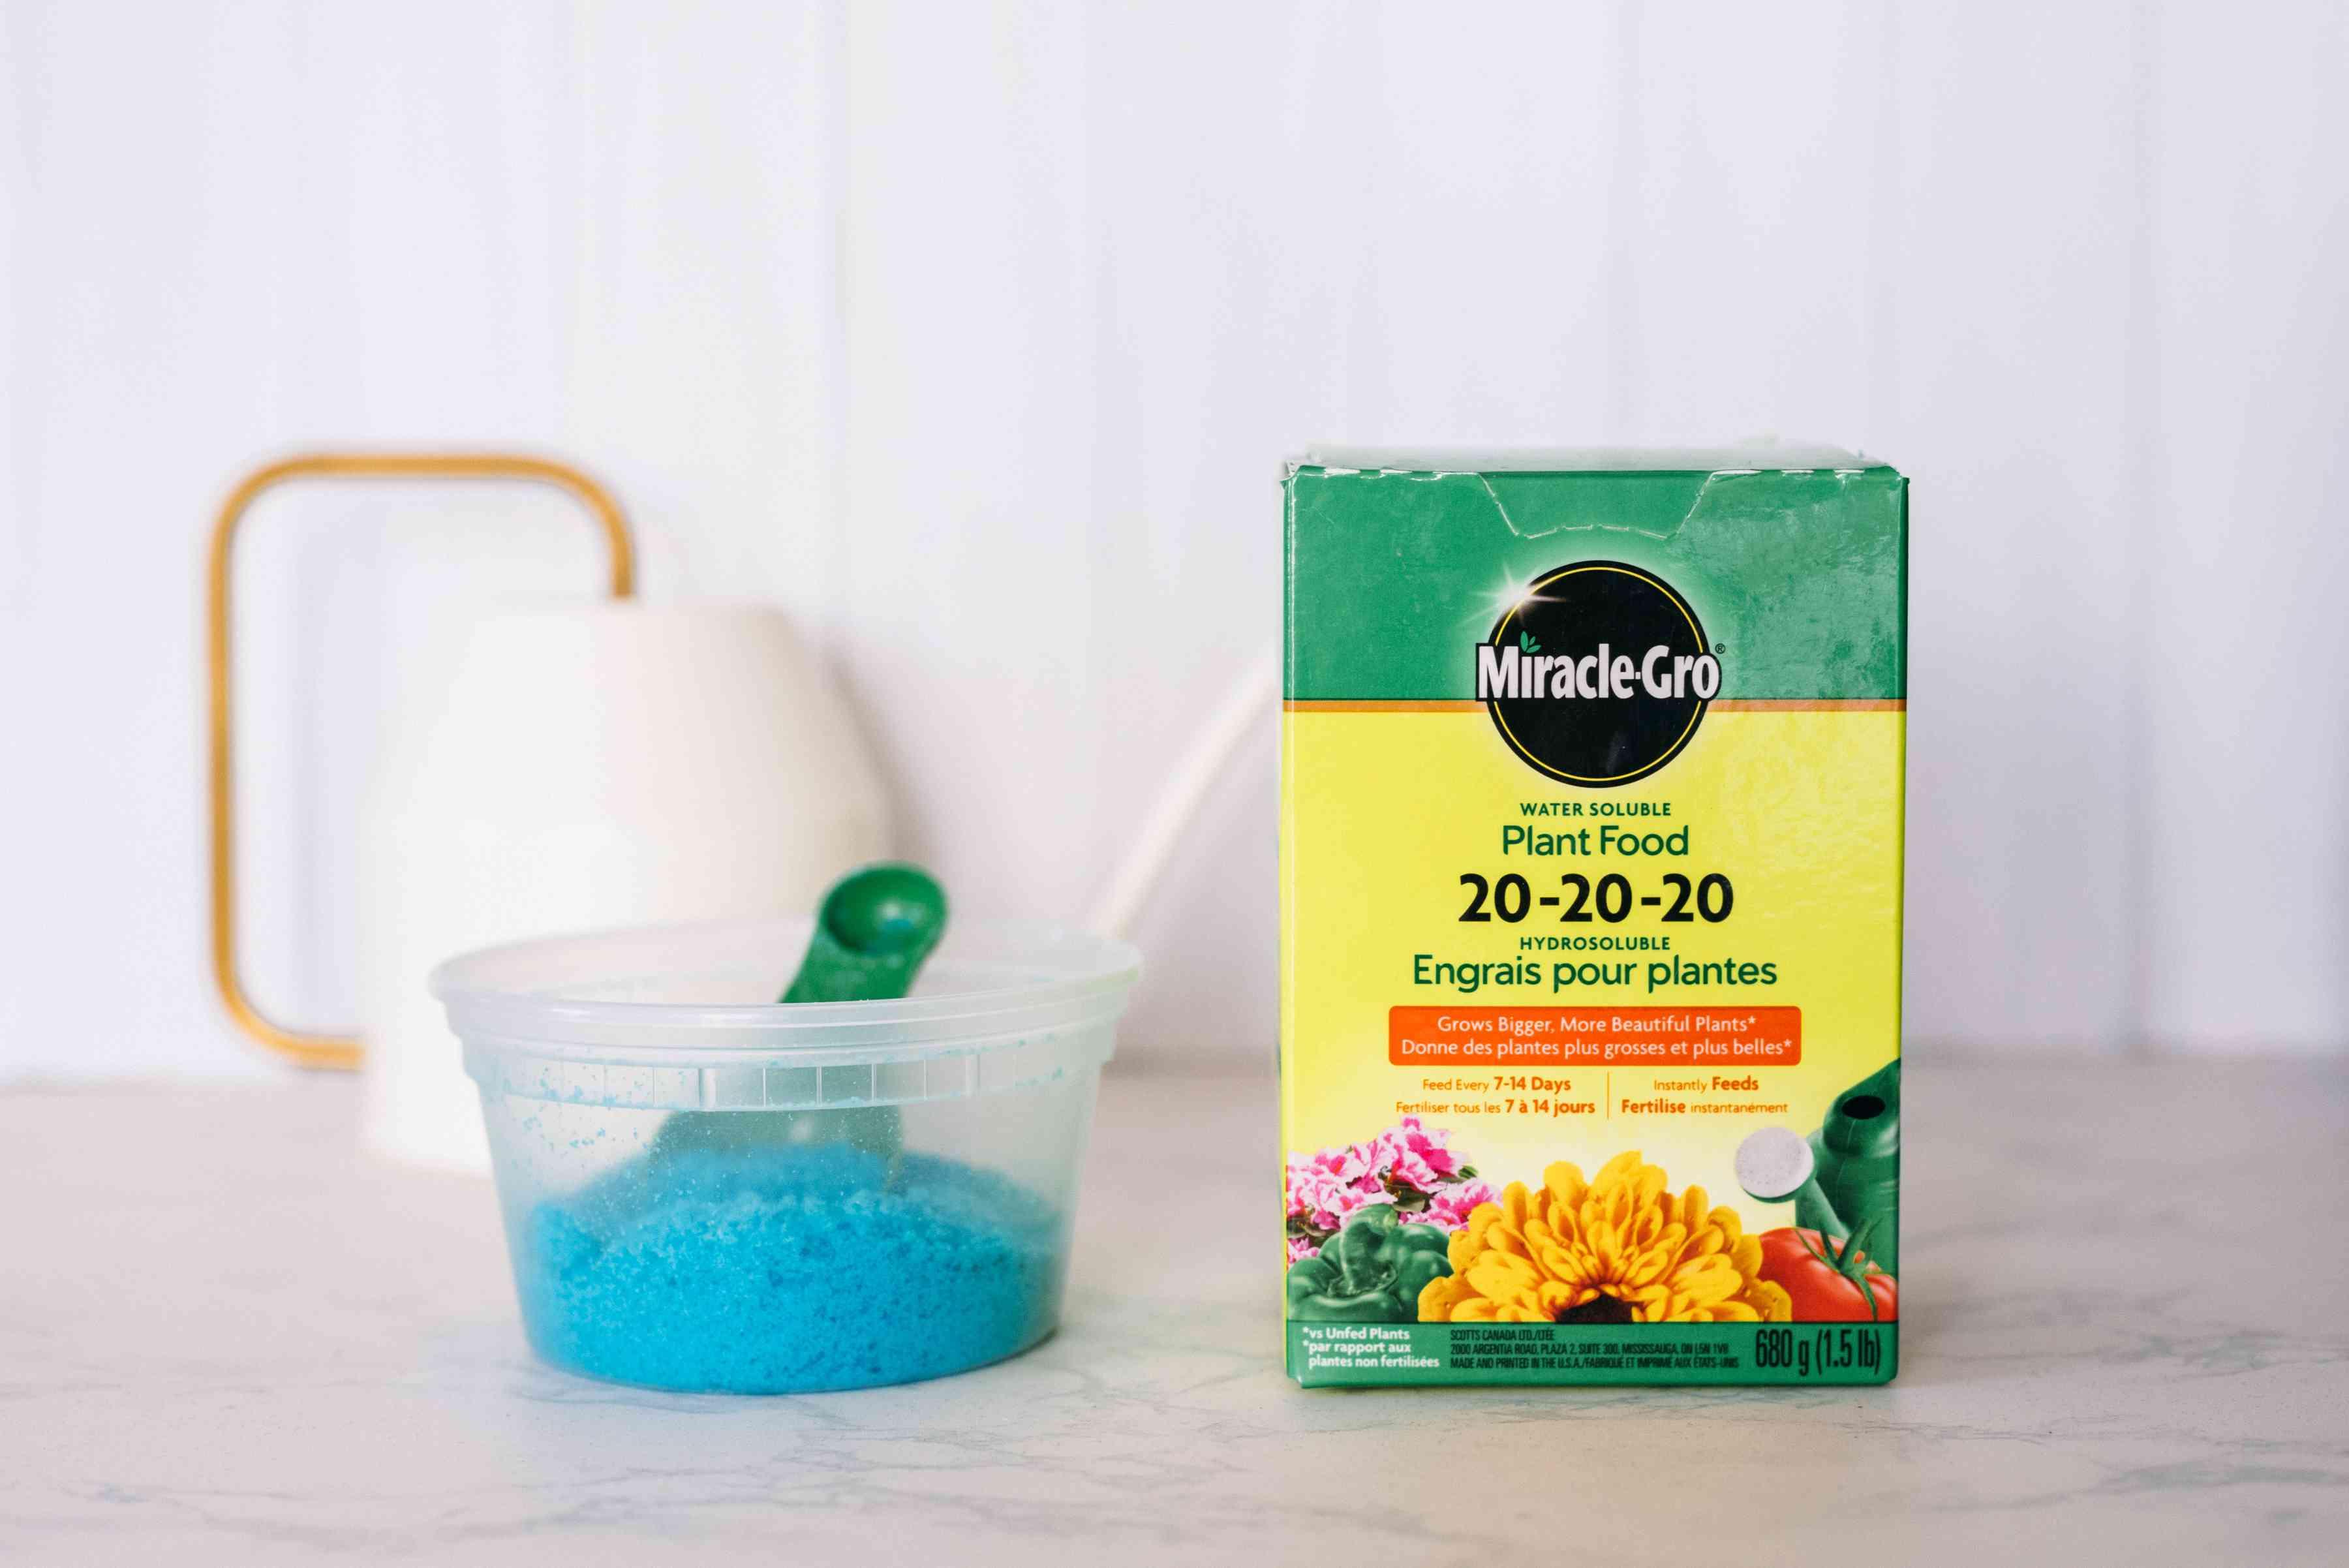 Miracle Gro fertilizer